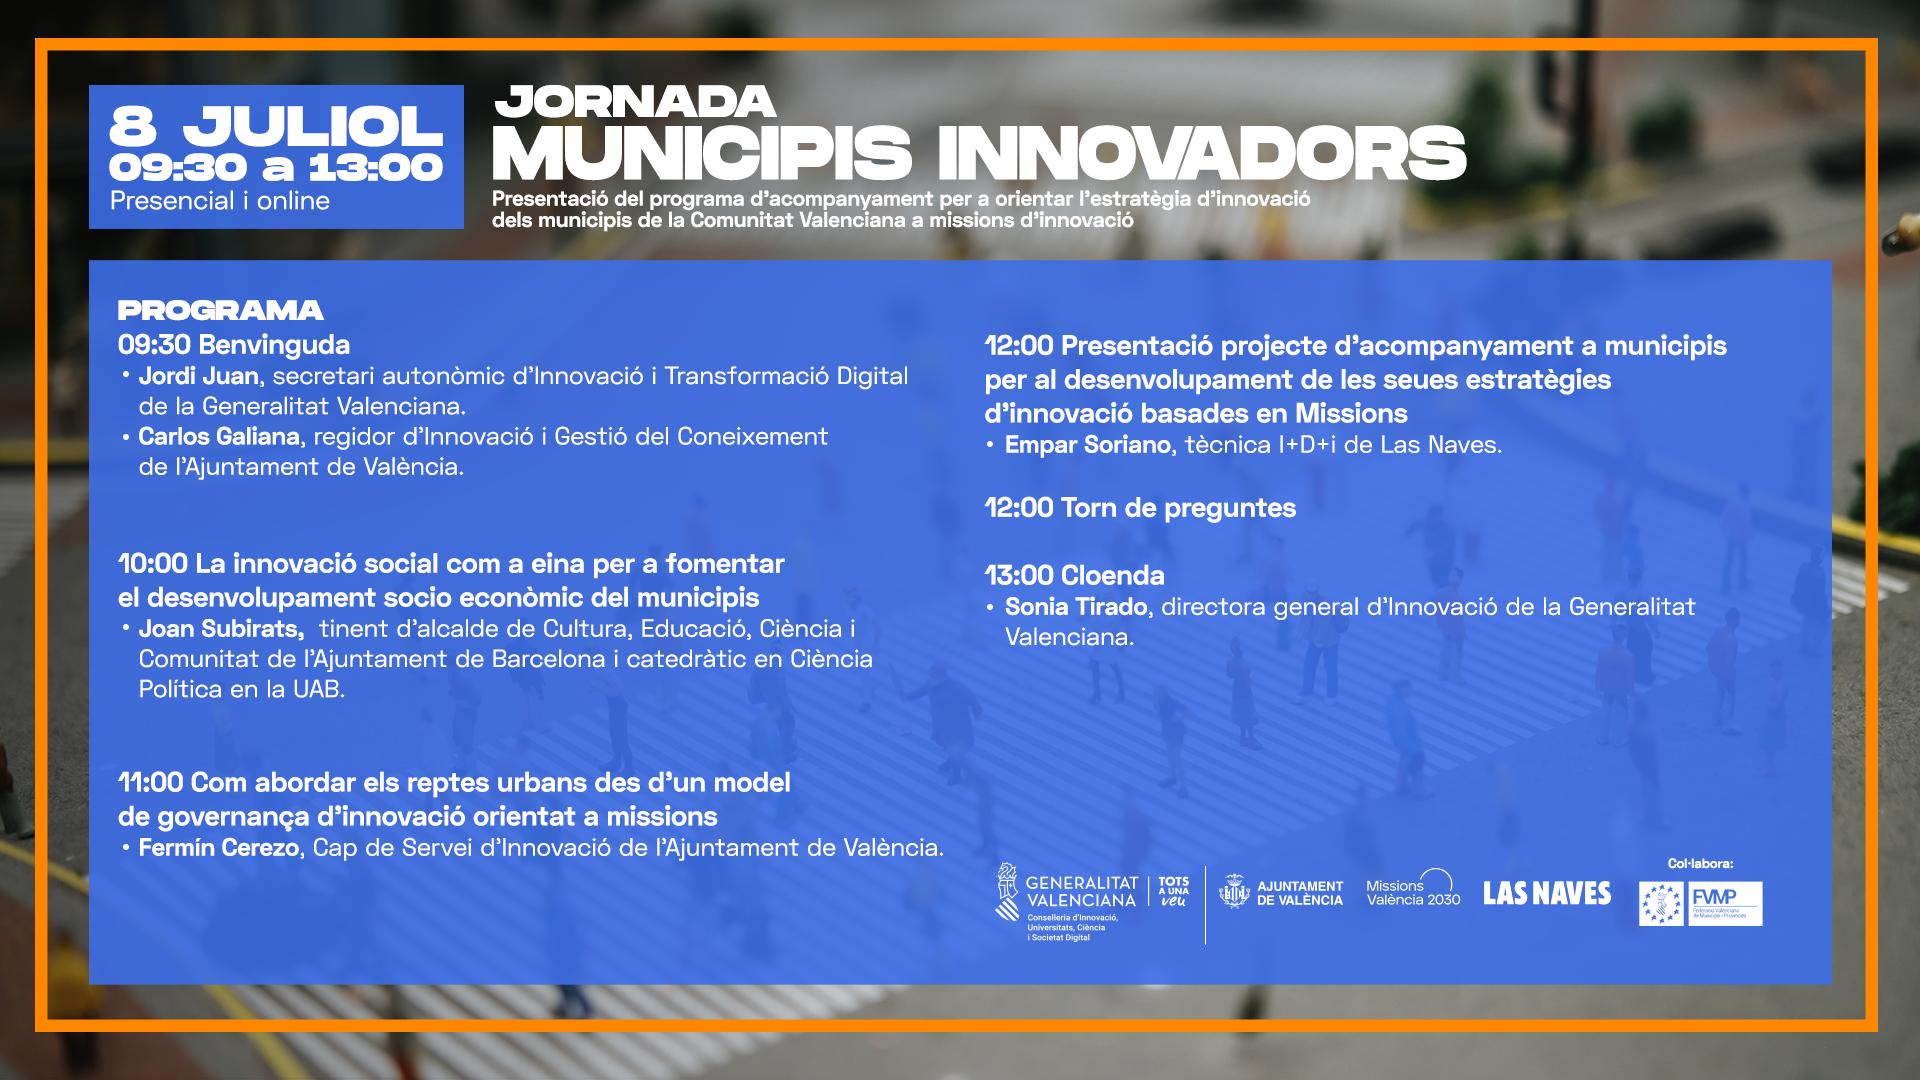 Jornada Valencia 8 juliol_Municipis innovadors_PROGRAMA_02